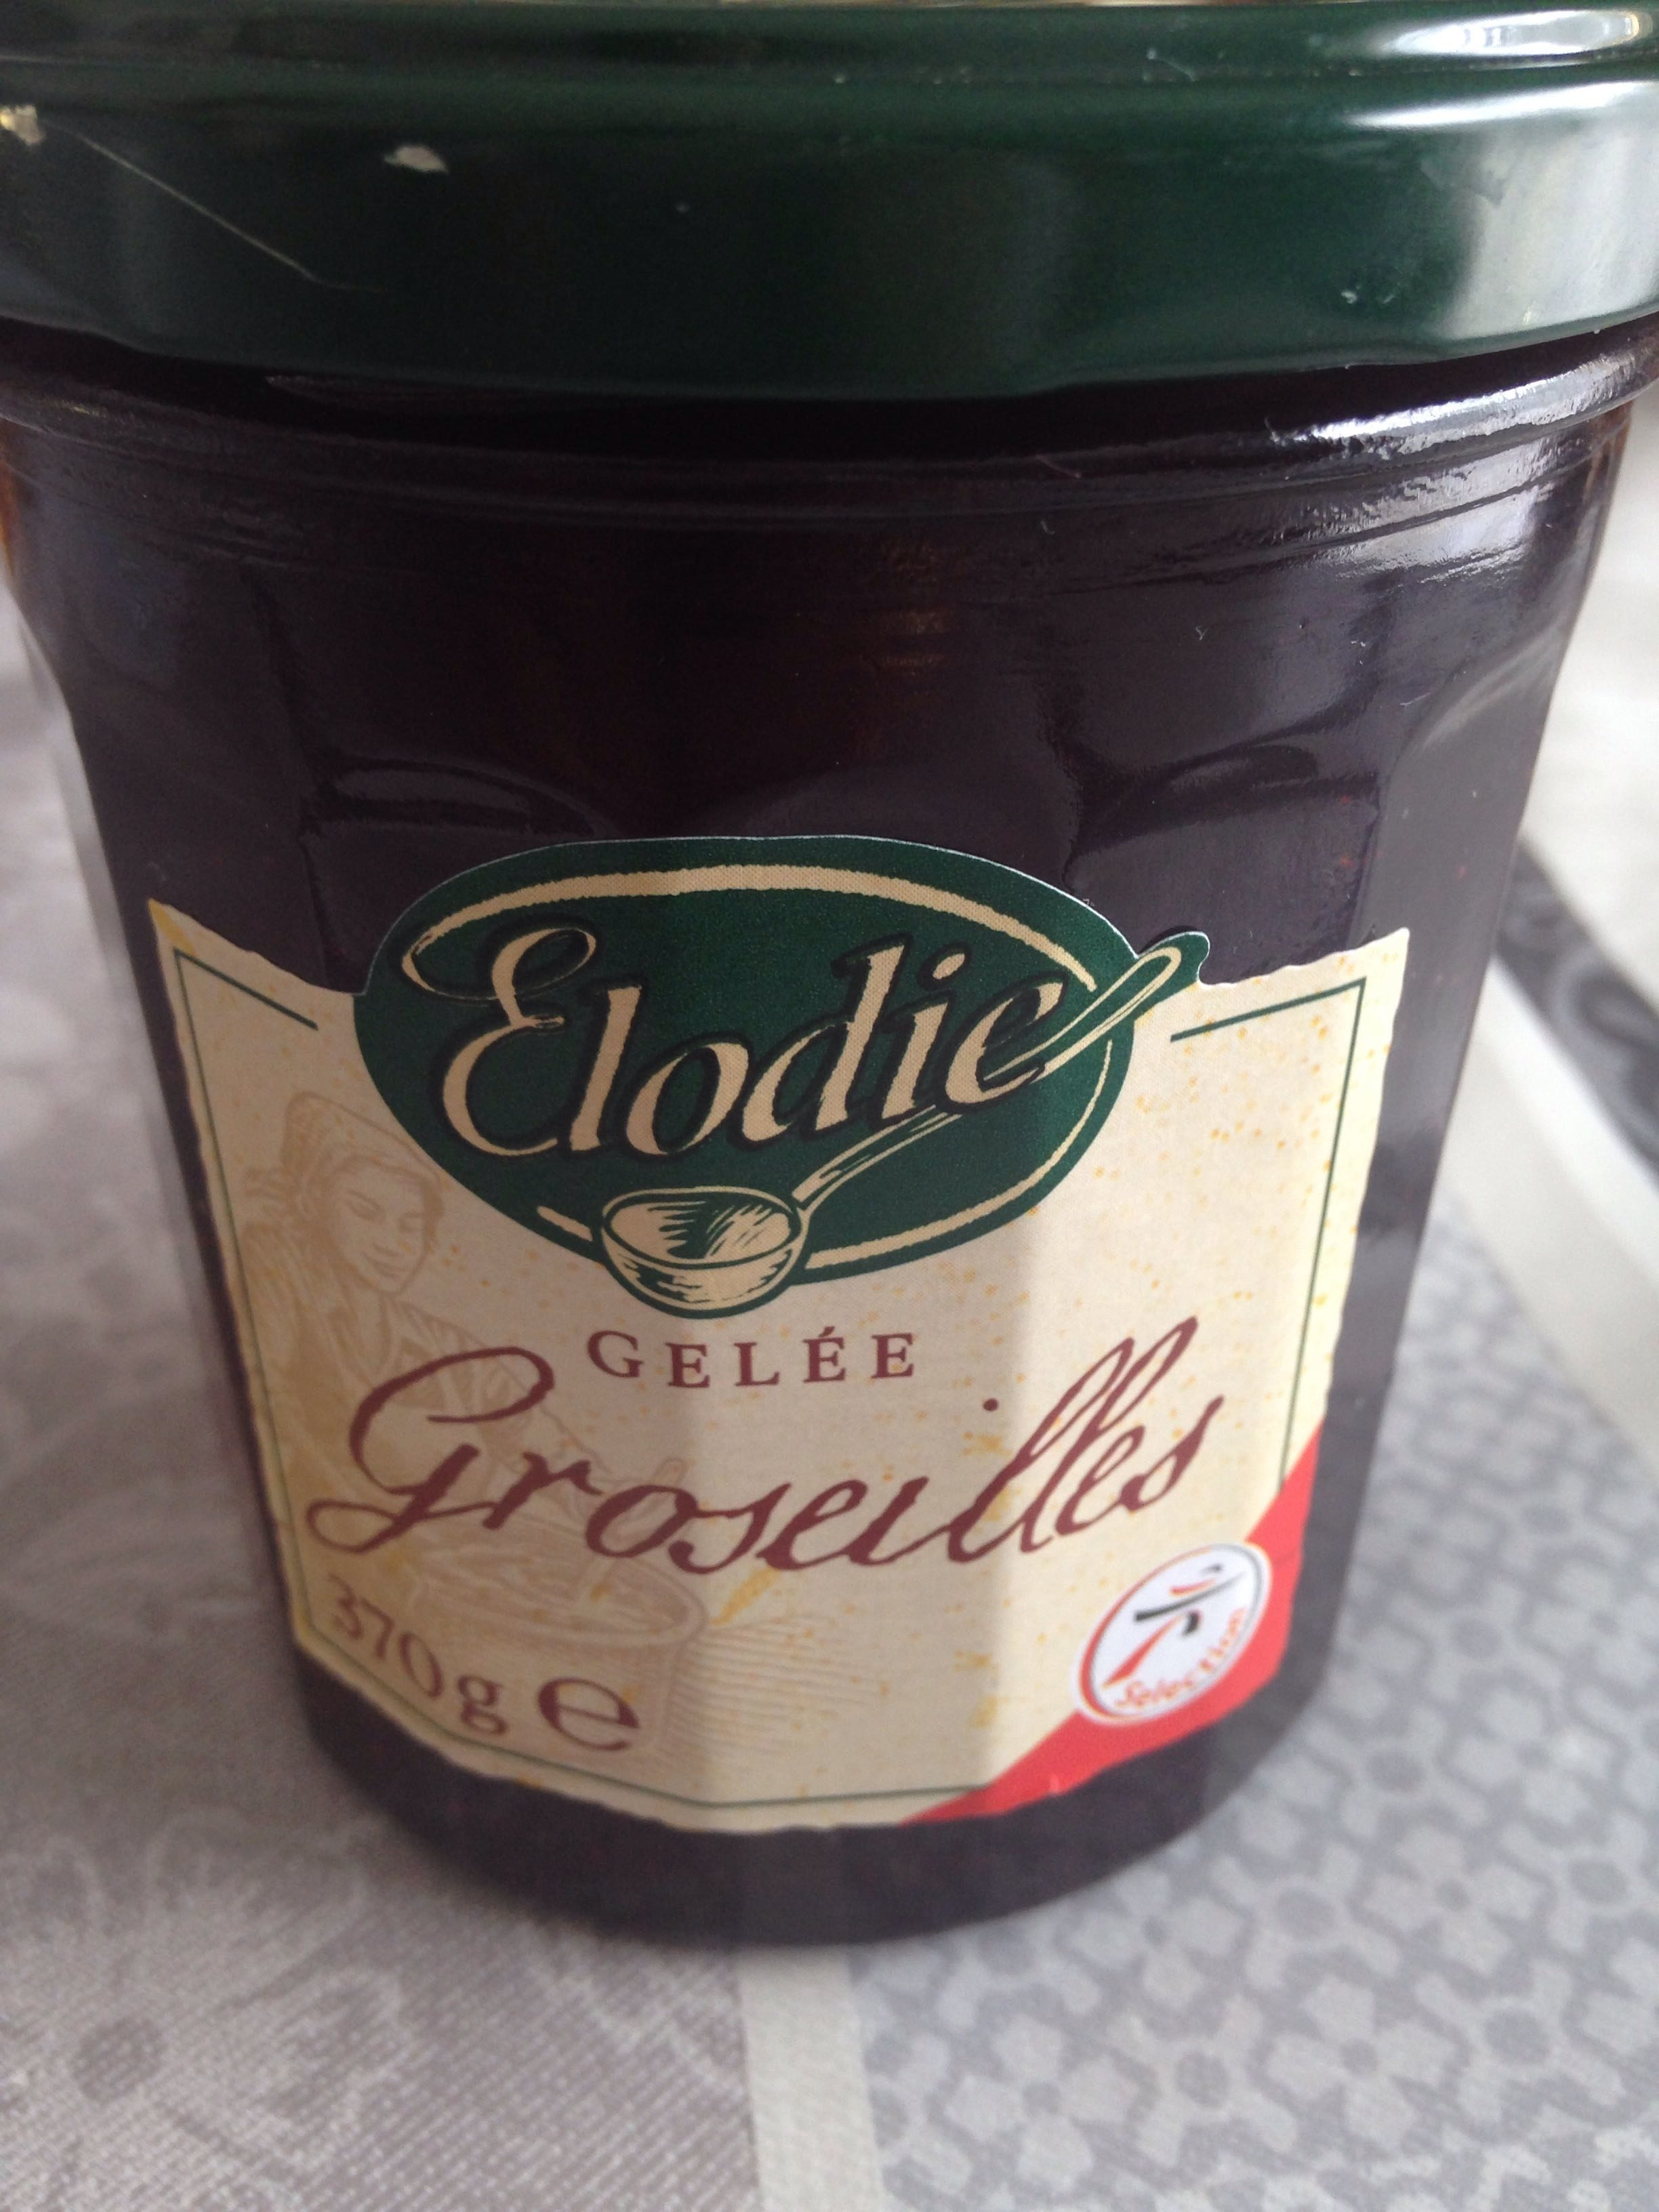 Gelée de groseille - Product - fr